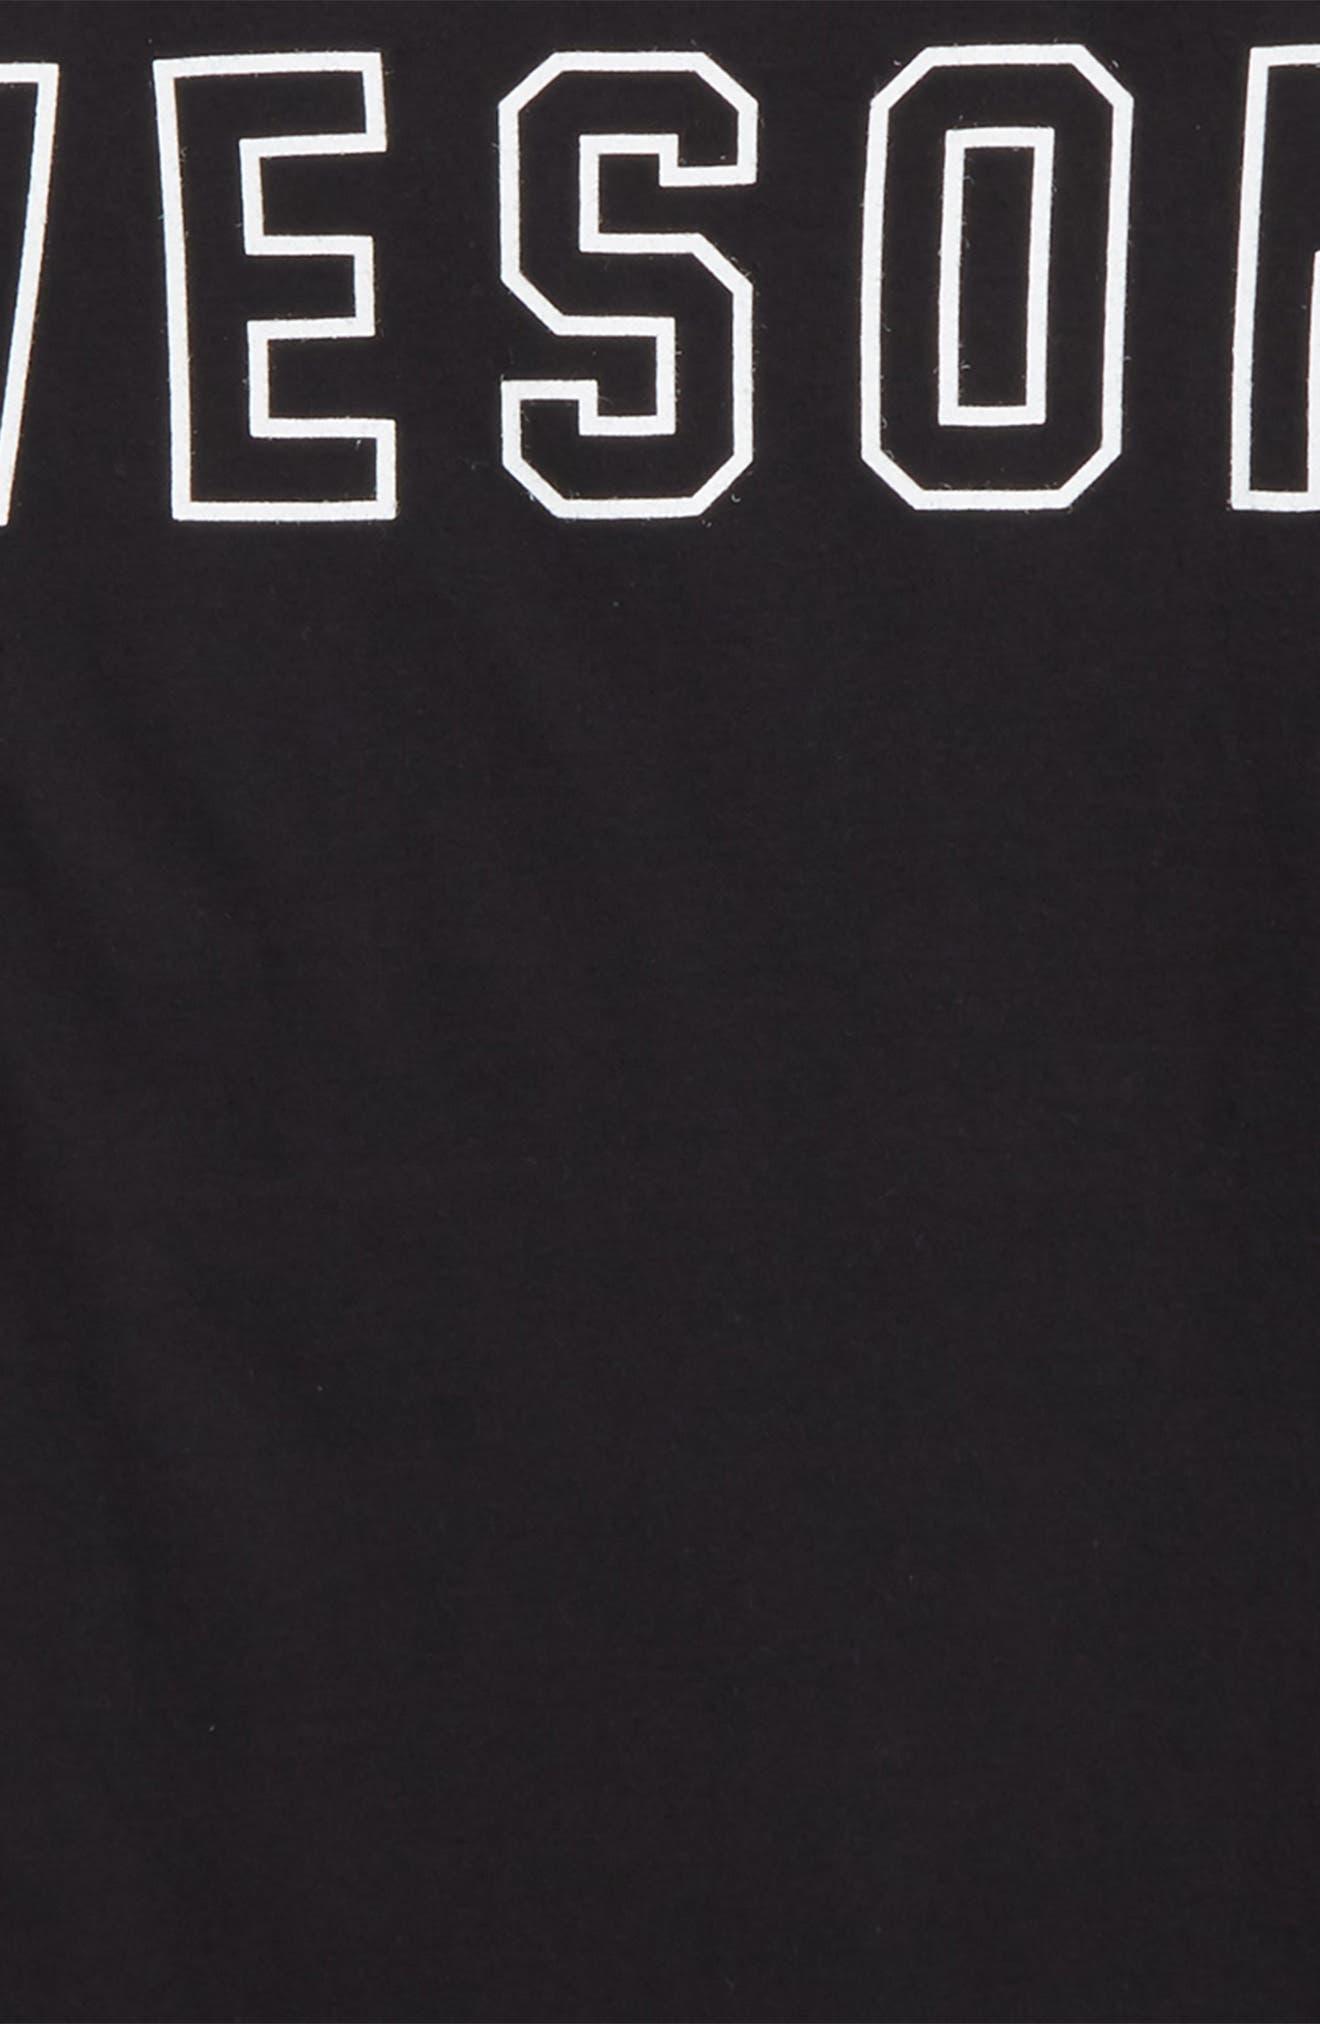 Dixon Awesome Organic Cotton T-Shirt,                             Alternate thumbnail 2, color,                             001